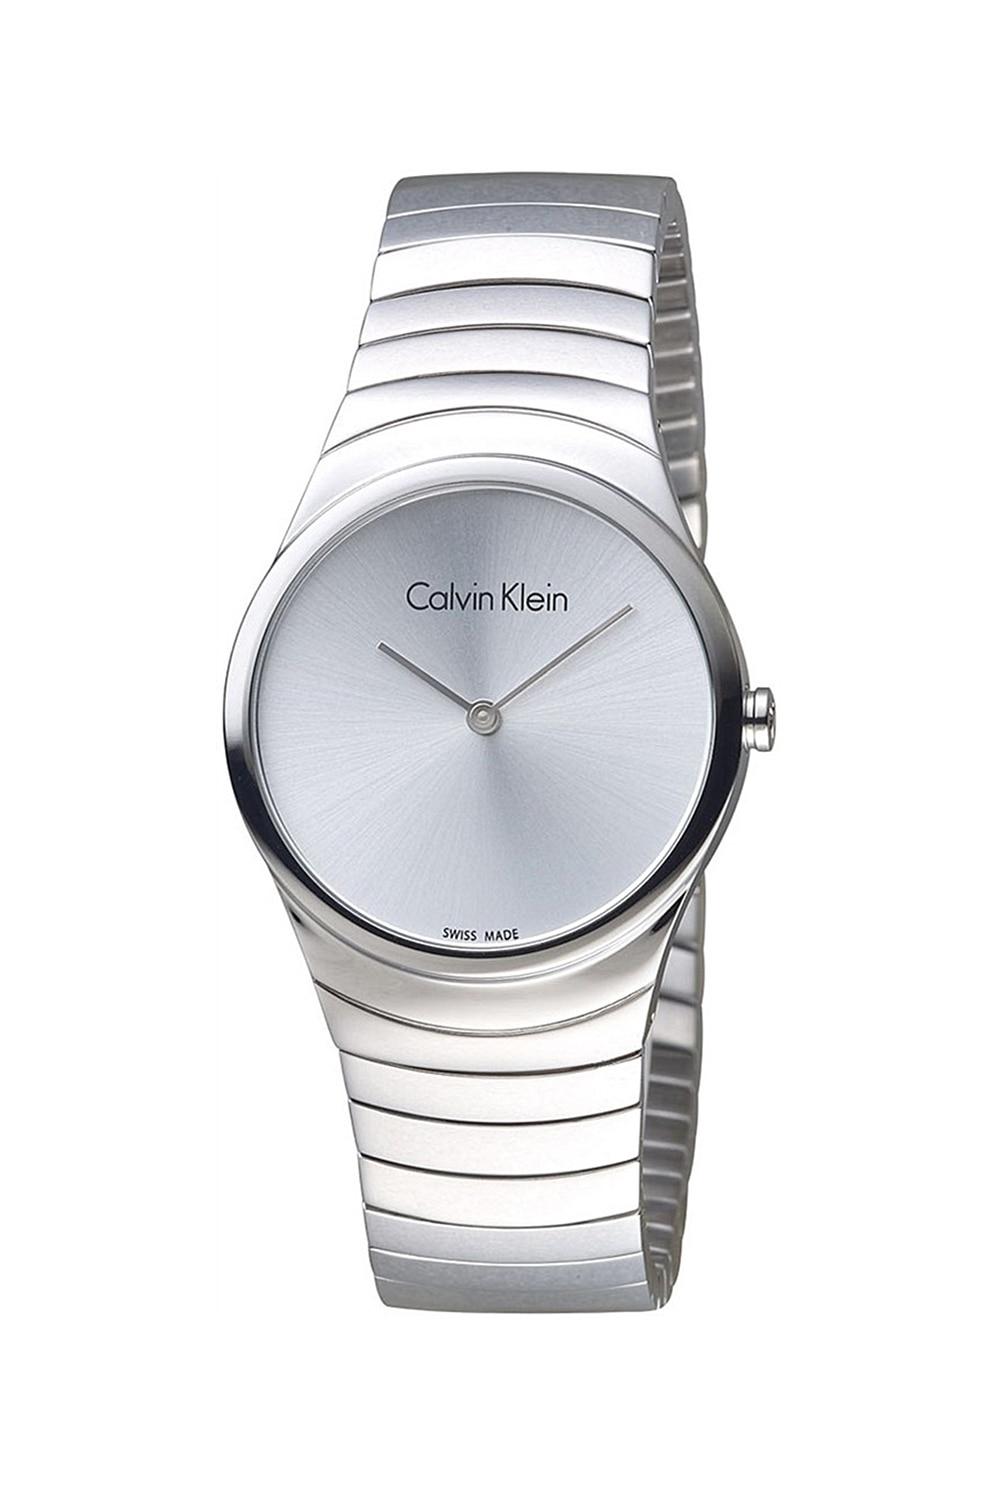 Fotografie Calvin Klein, Ceas rotund cu bratara metalica, Argintiu